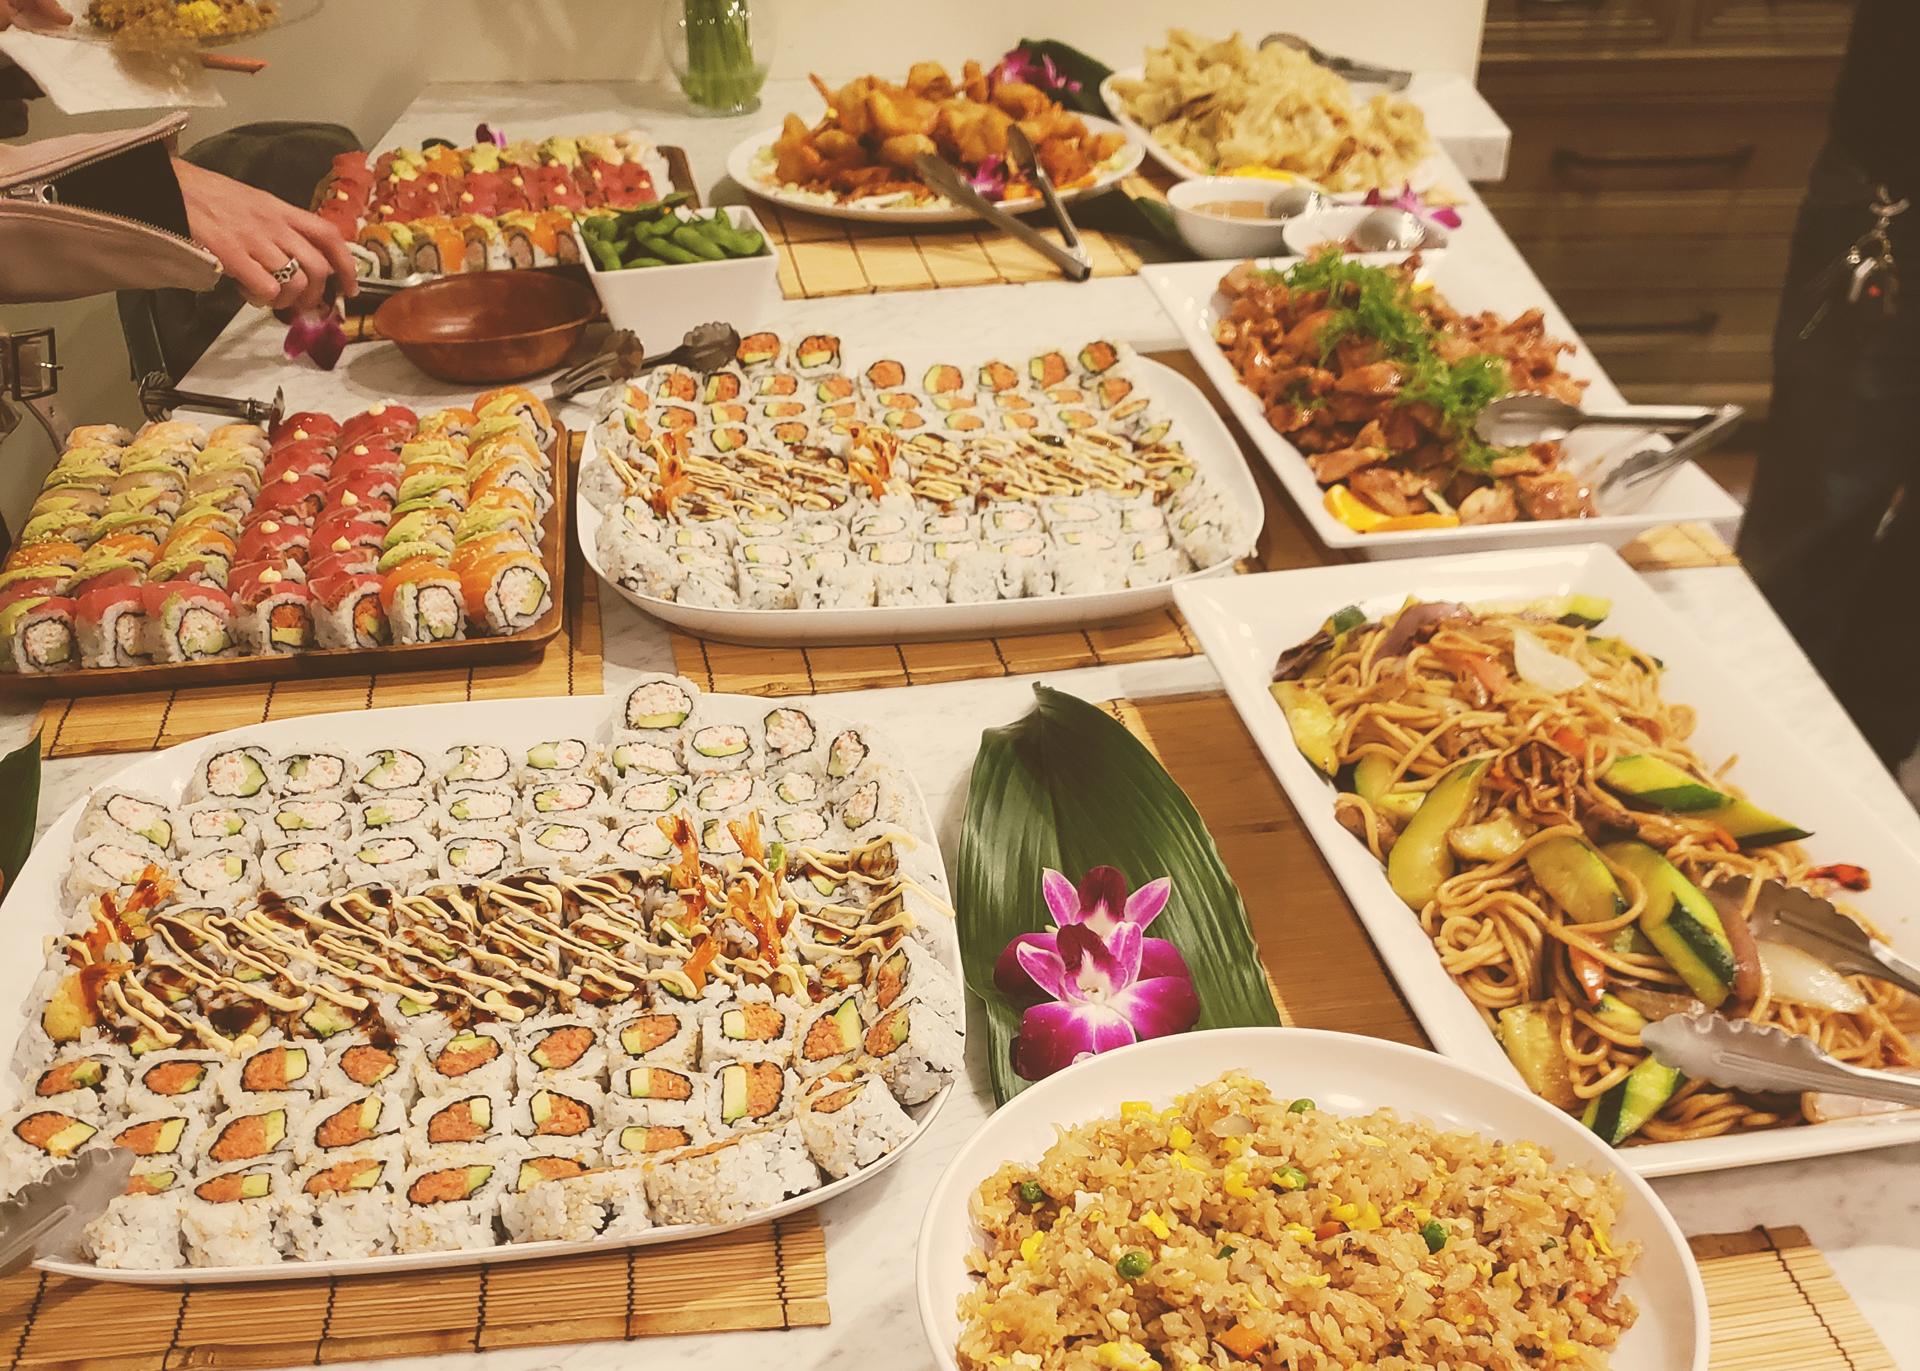 akioni-catering-sushi-teppanyaki-authentic-japanese-cuisine-hawaiian-bbq-hibachi-tacos.jpg